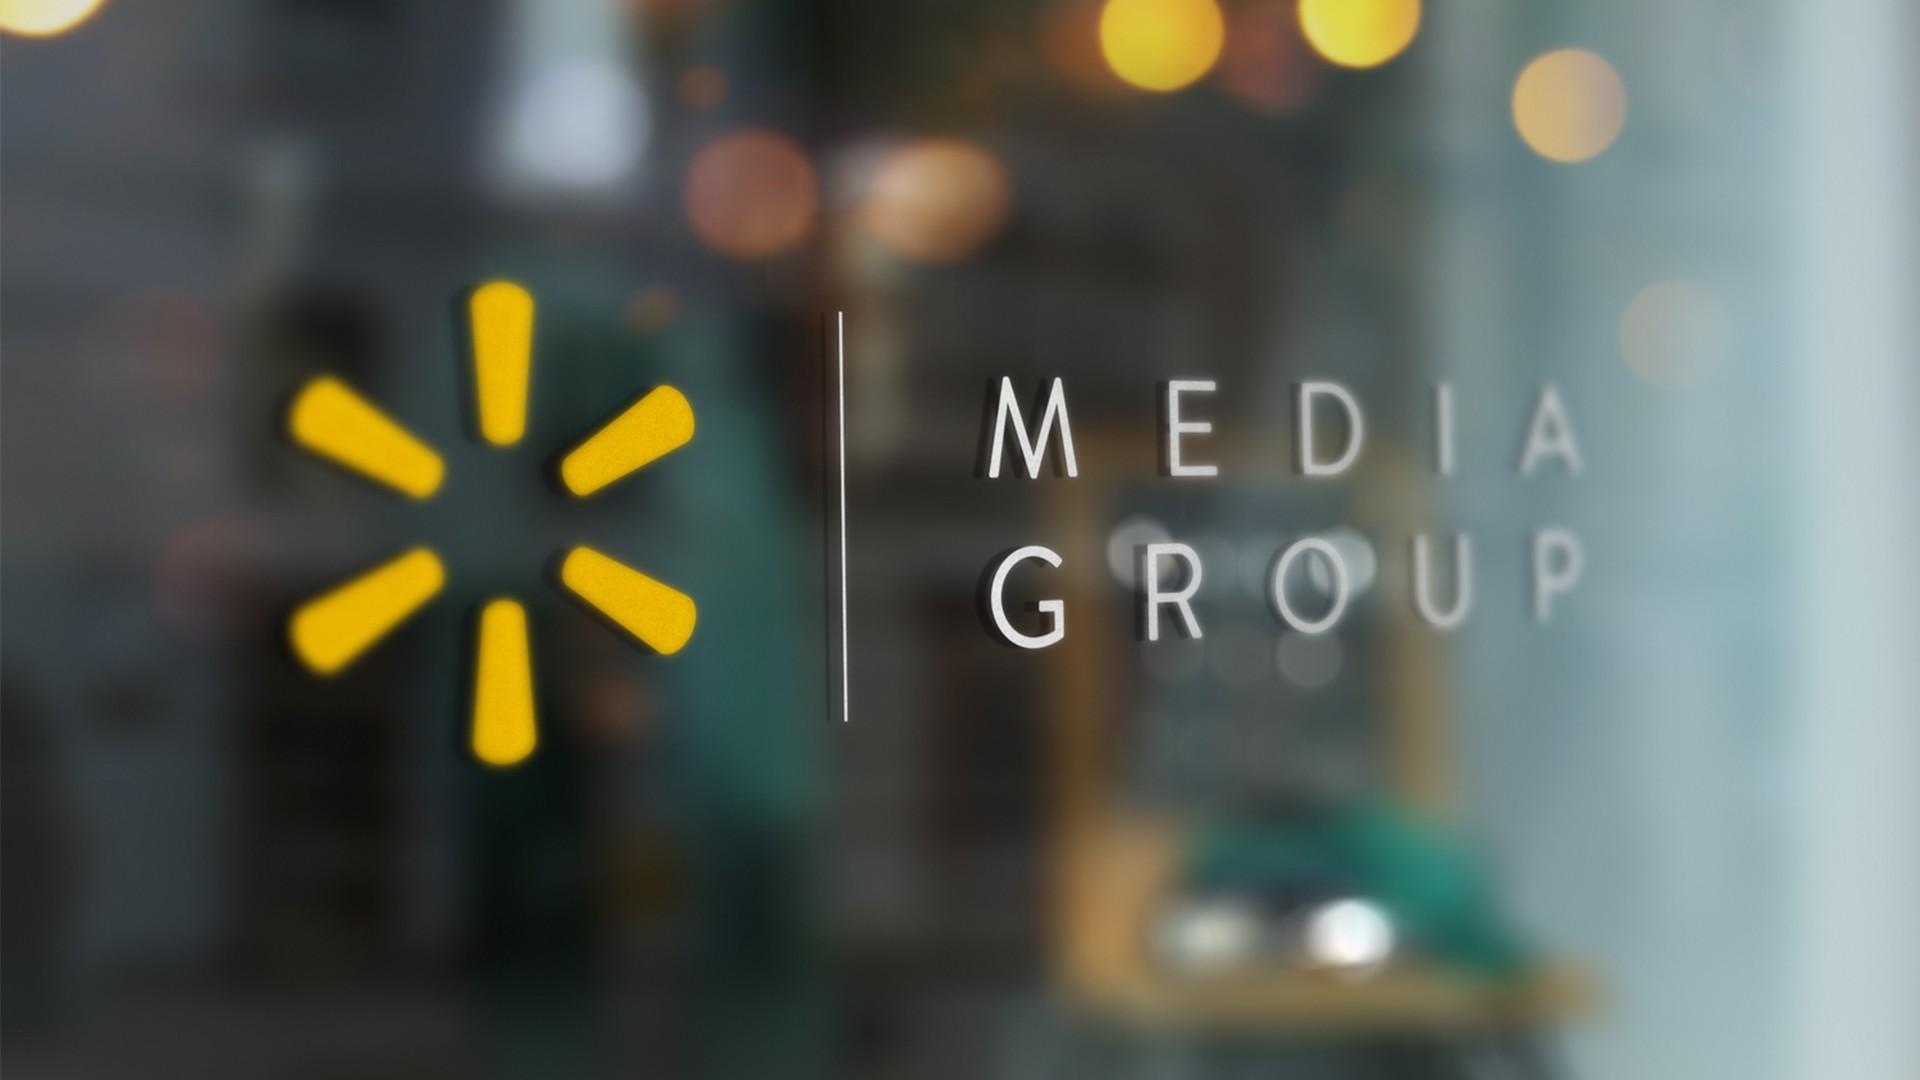 Walmart Media Group | LinkedIn